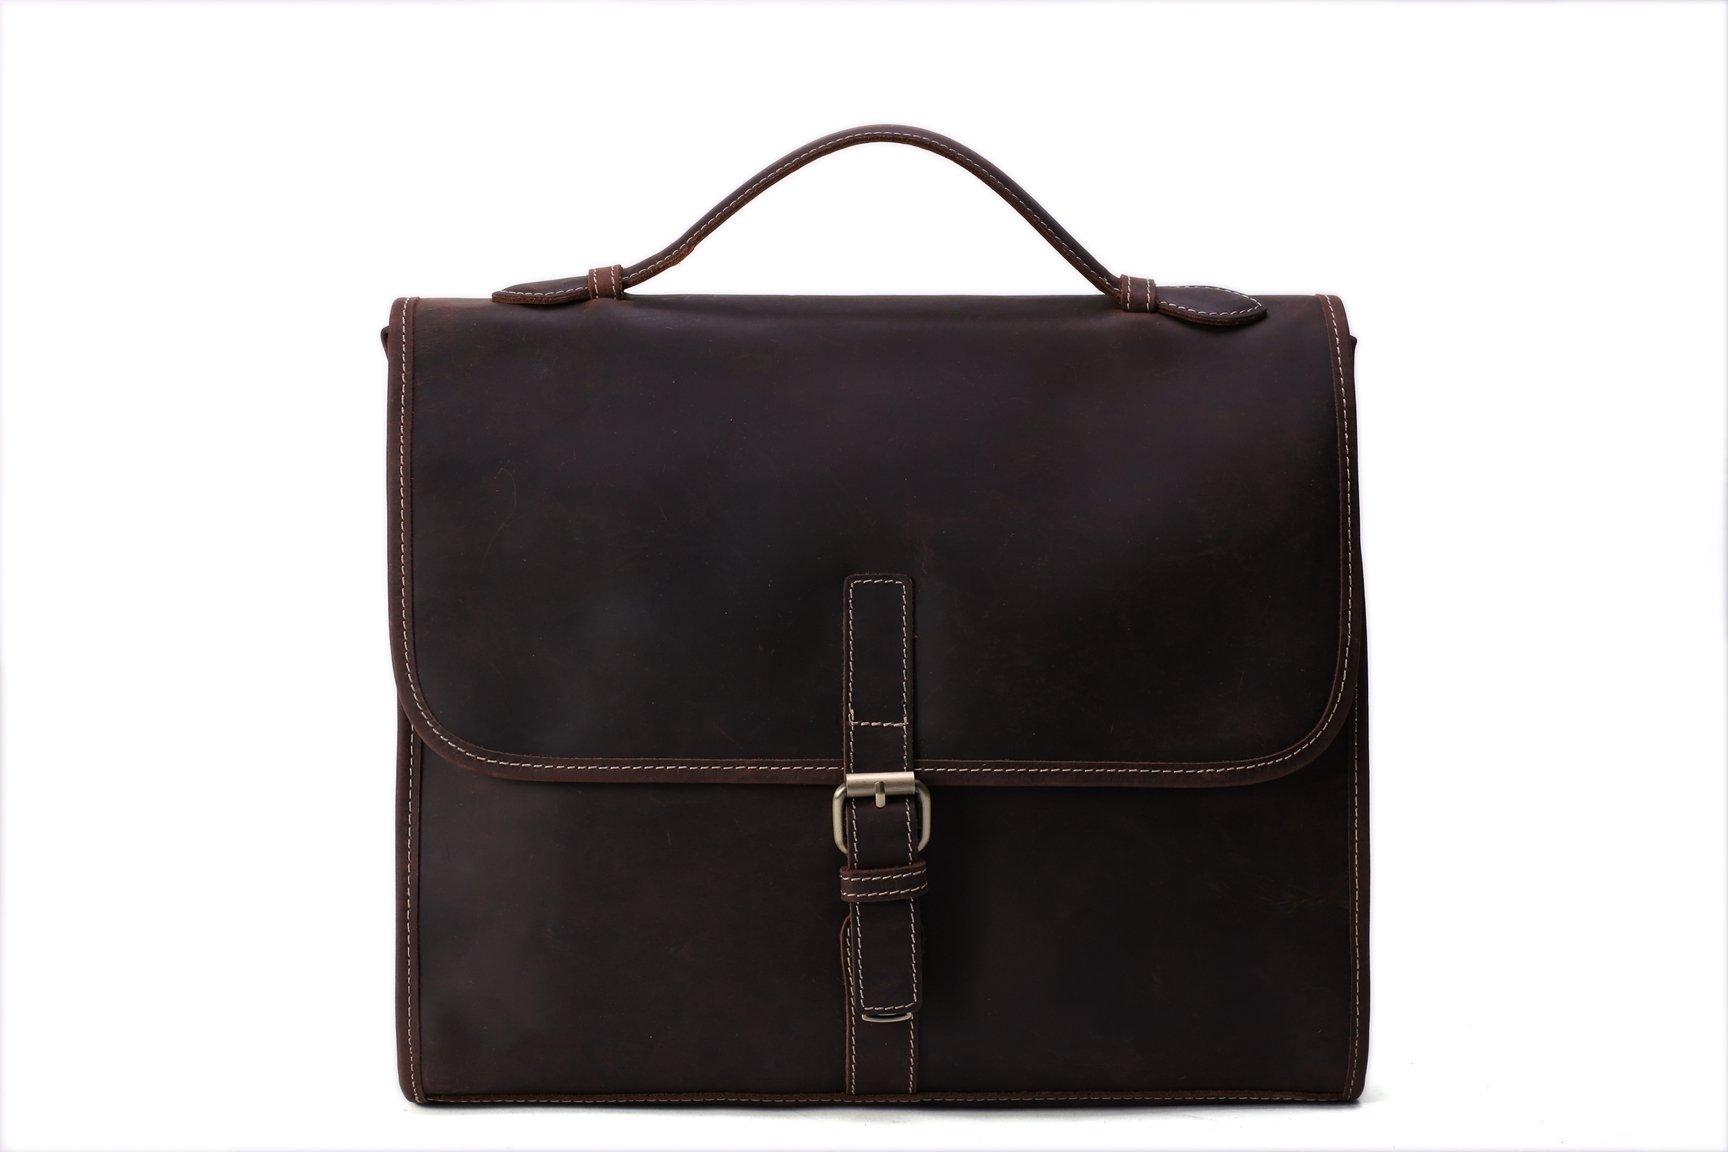 5a4a5b1a5ee MoshiLeatherBag - Handmade Leather Bag Manufacturer — Handcrafted Vintage  Men Leather Bag